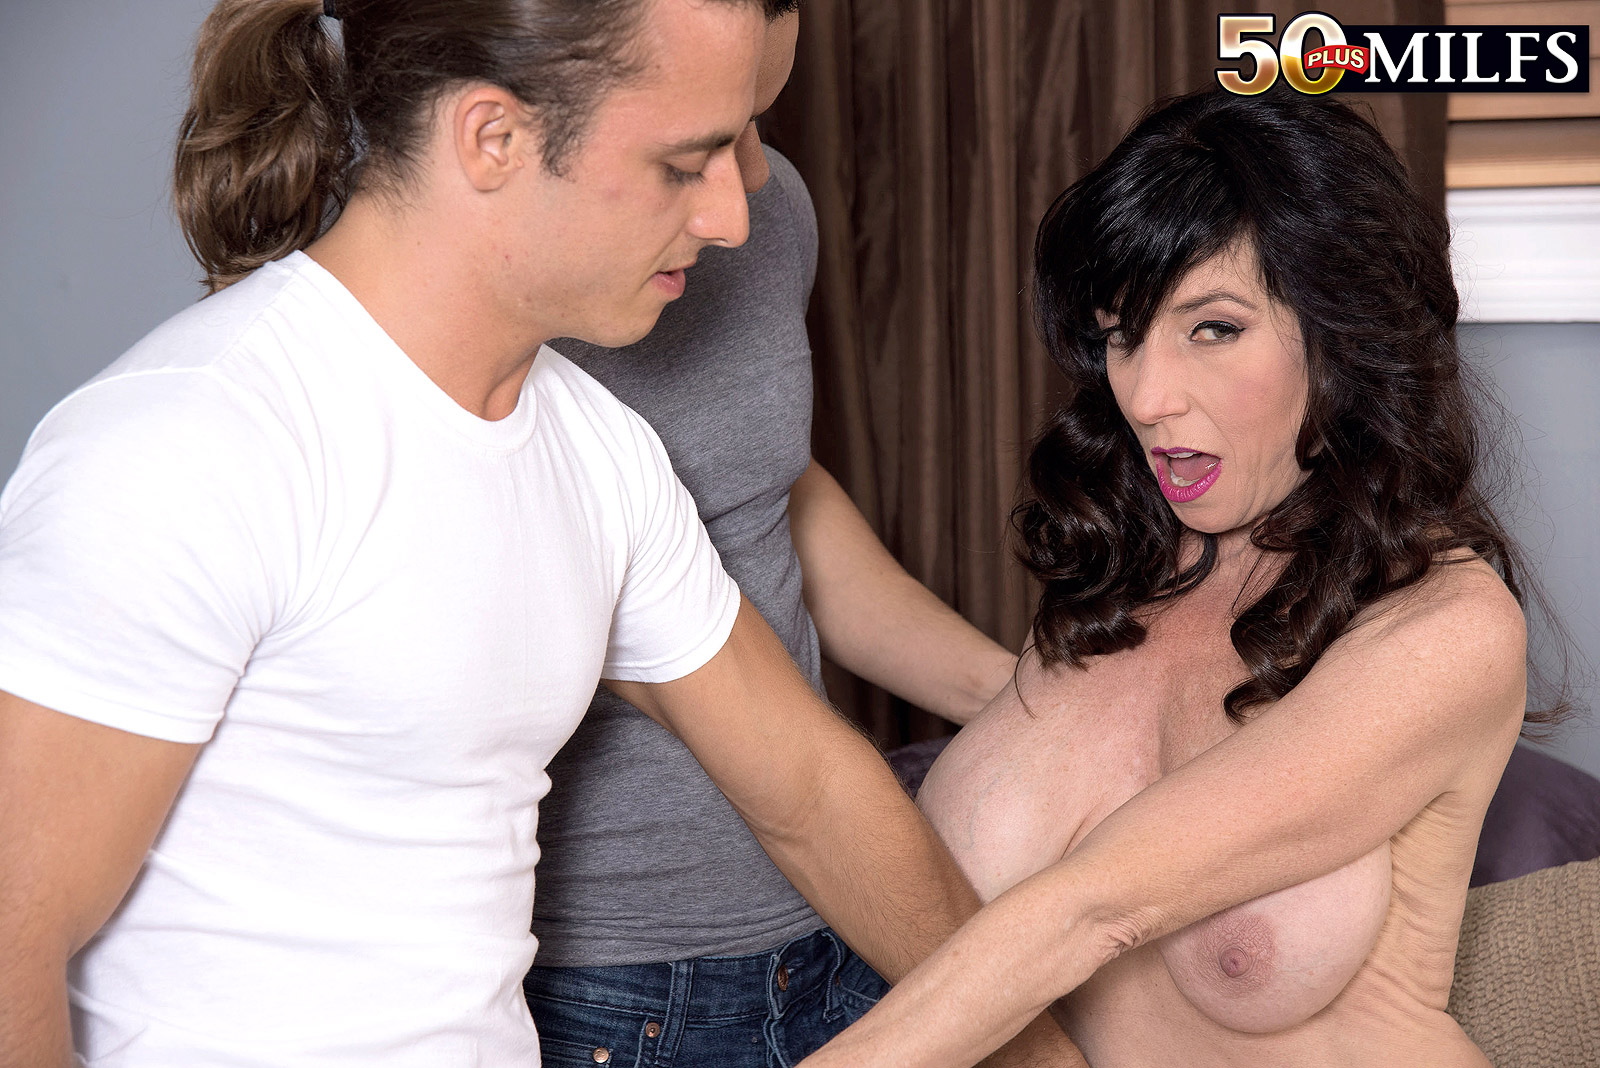 milf sandwich sex #5